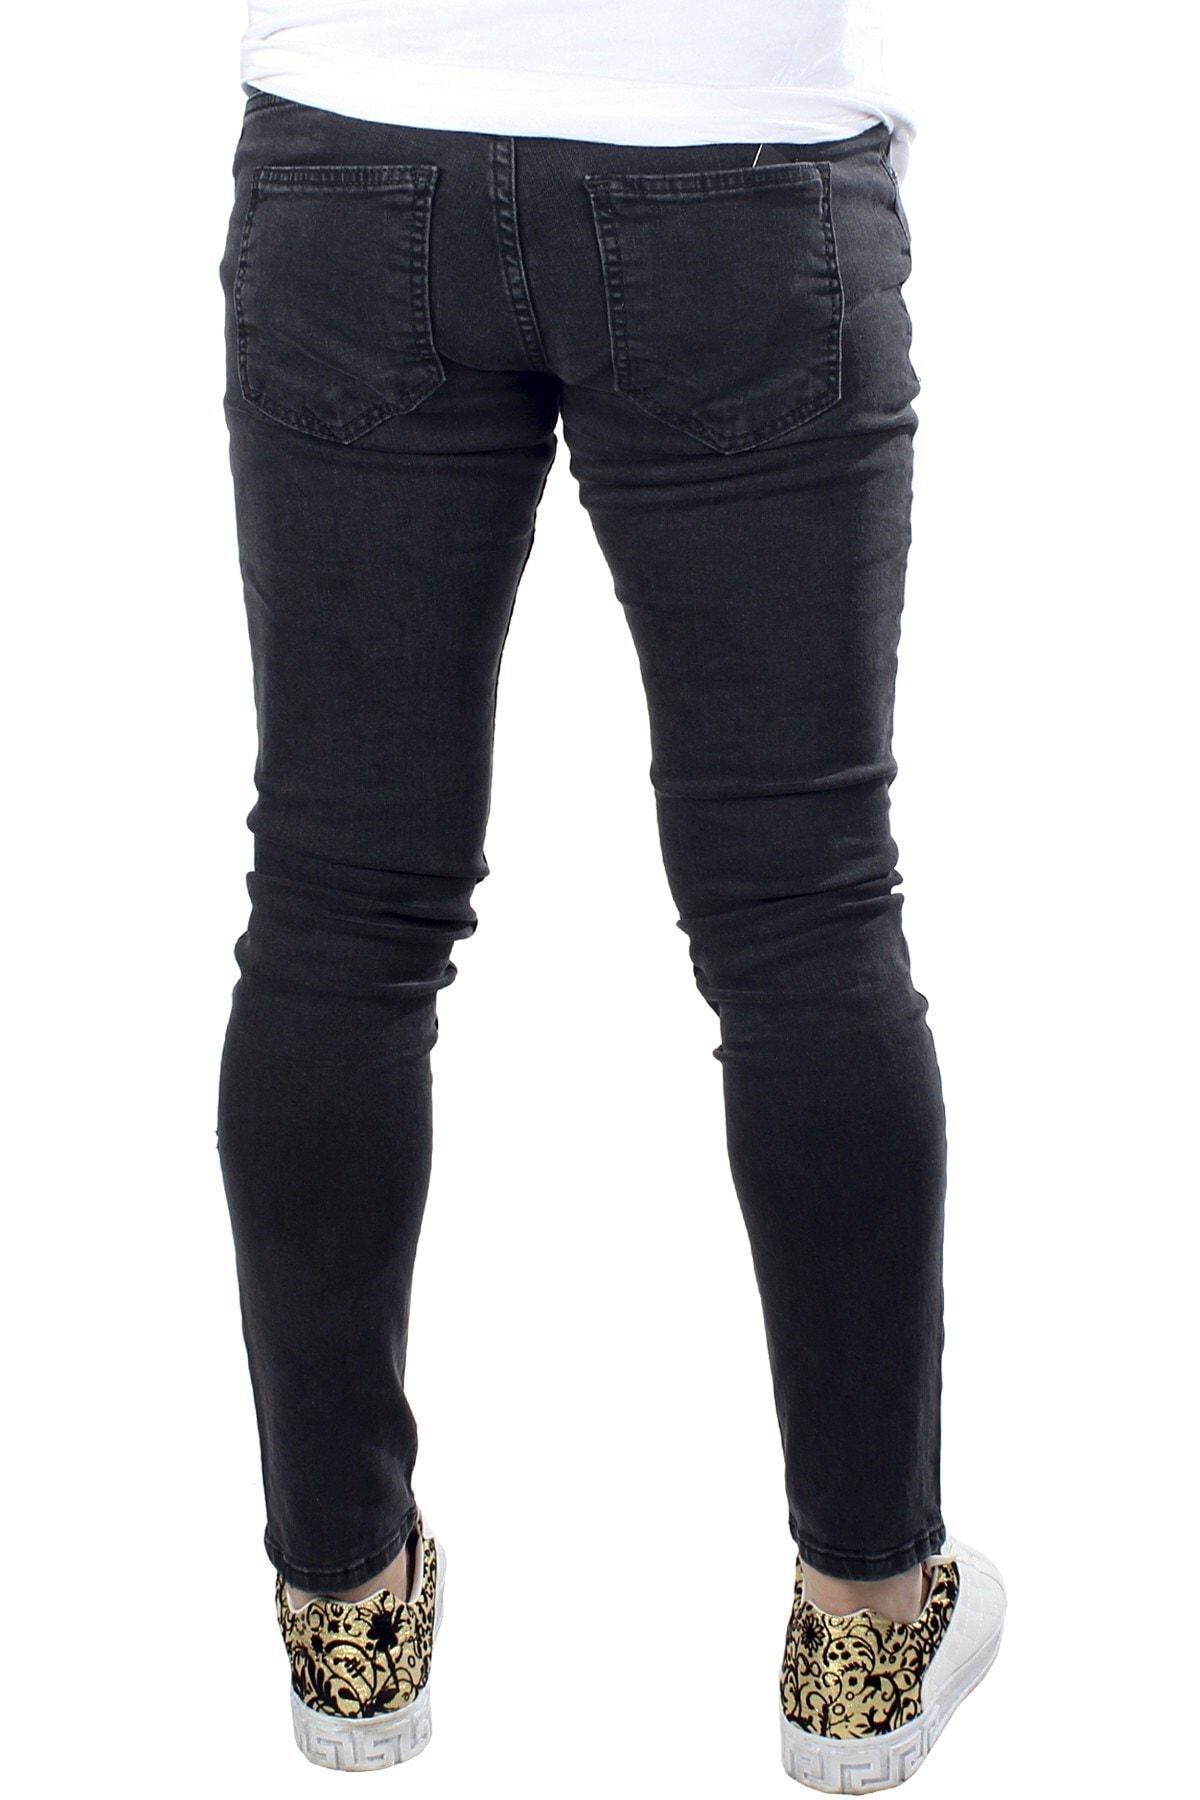 Terapi Men Erkek Kot Pantolon 9K-2100317-008 Füme 3